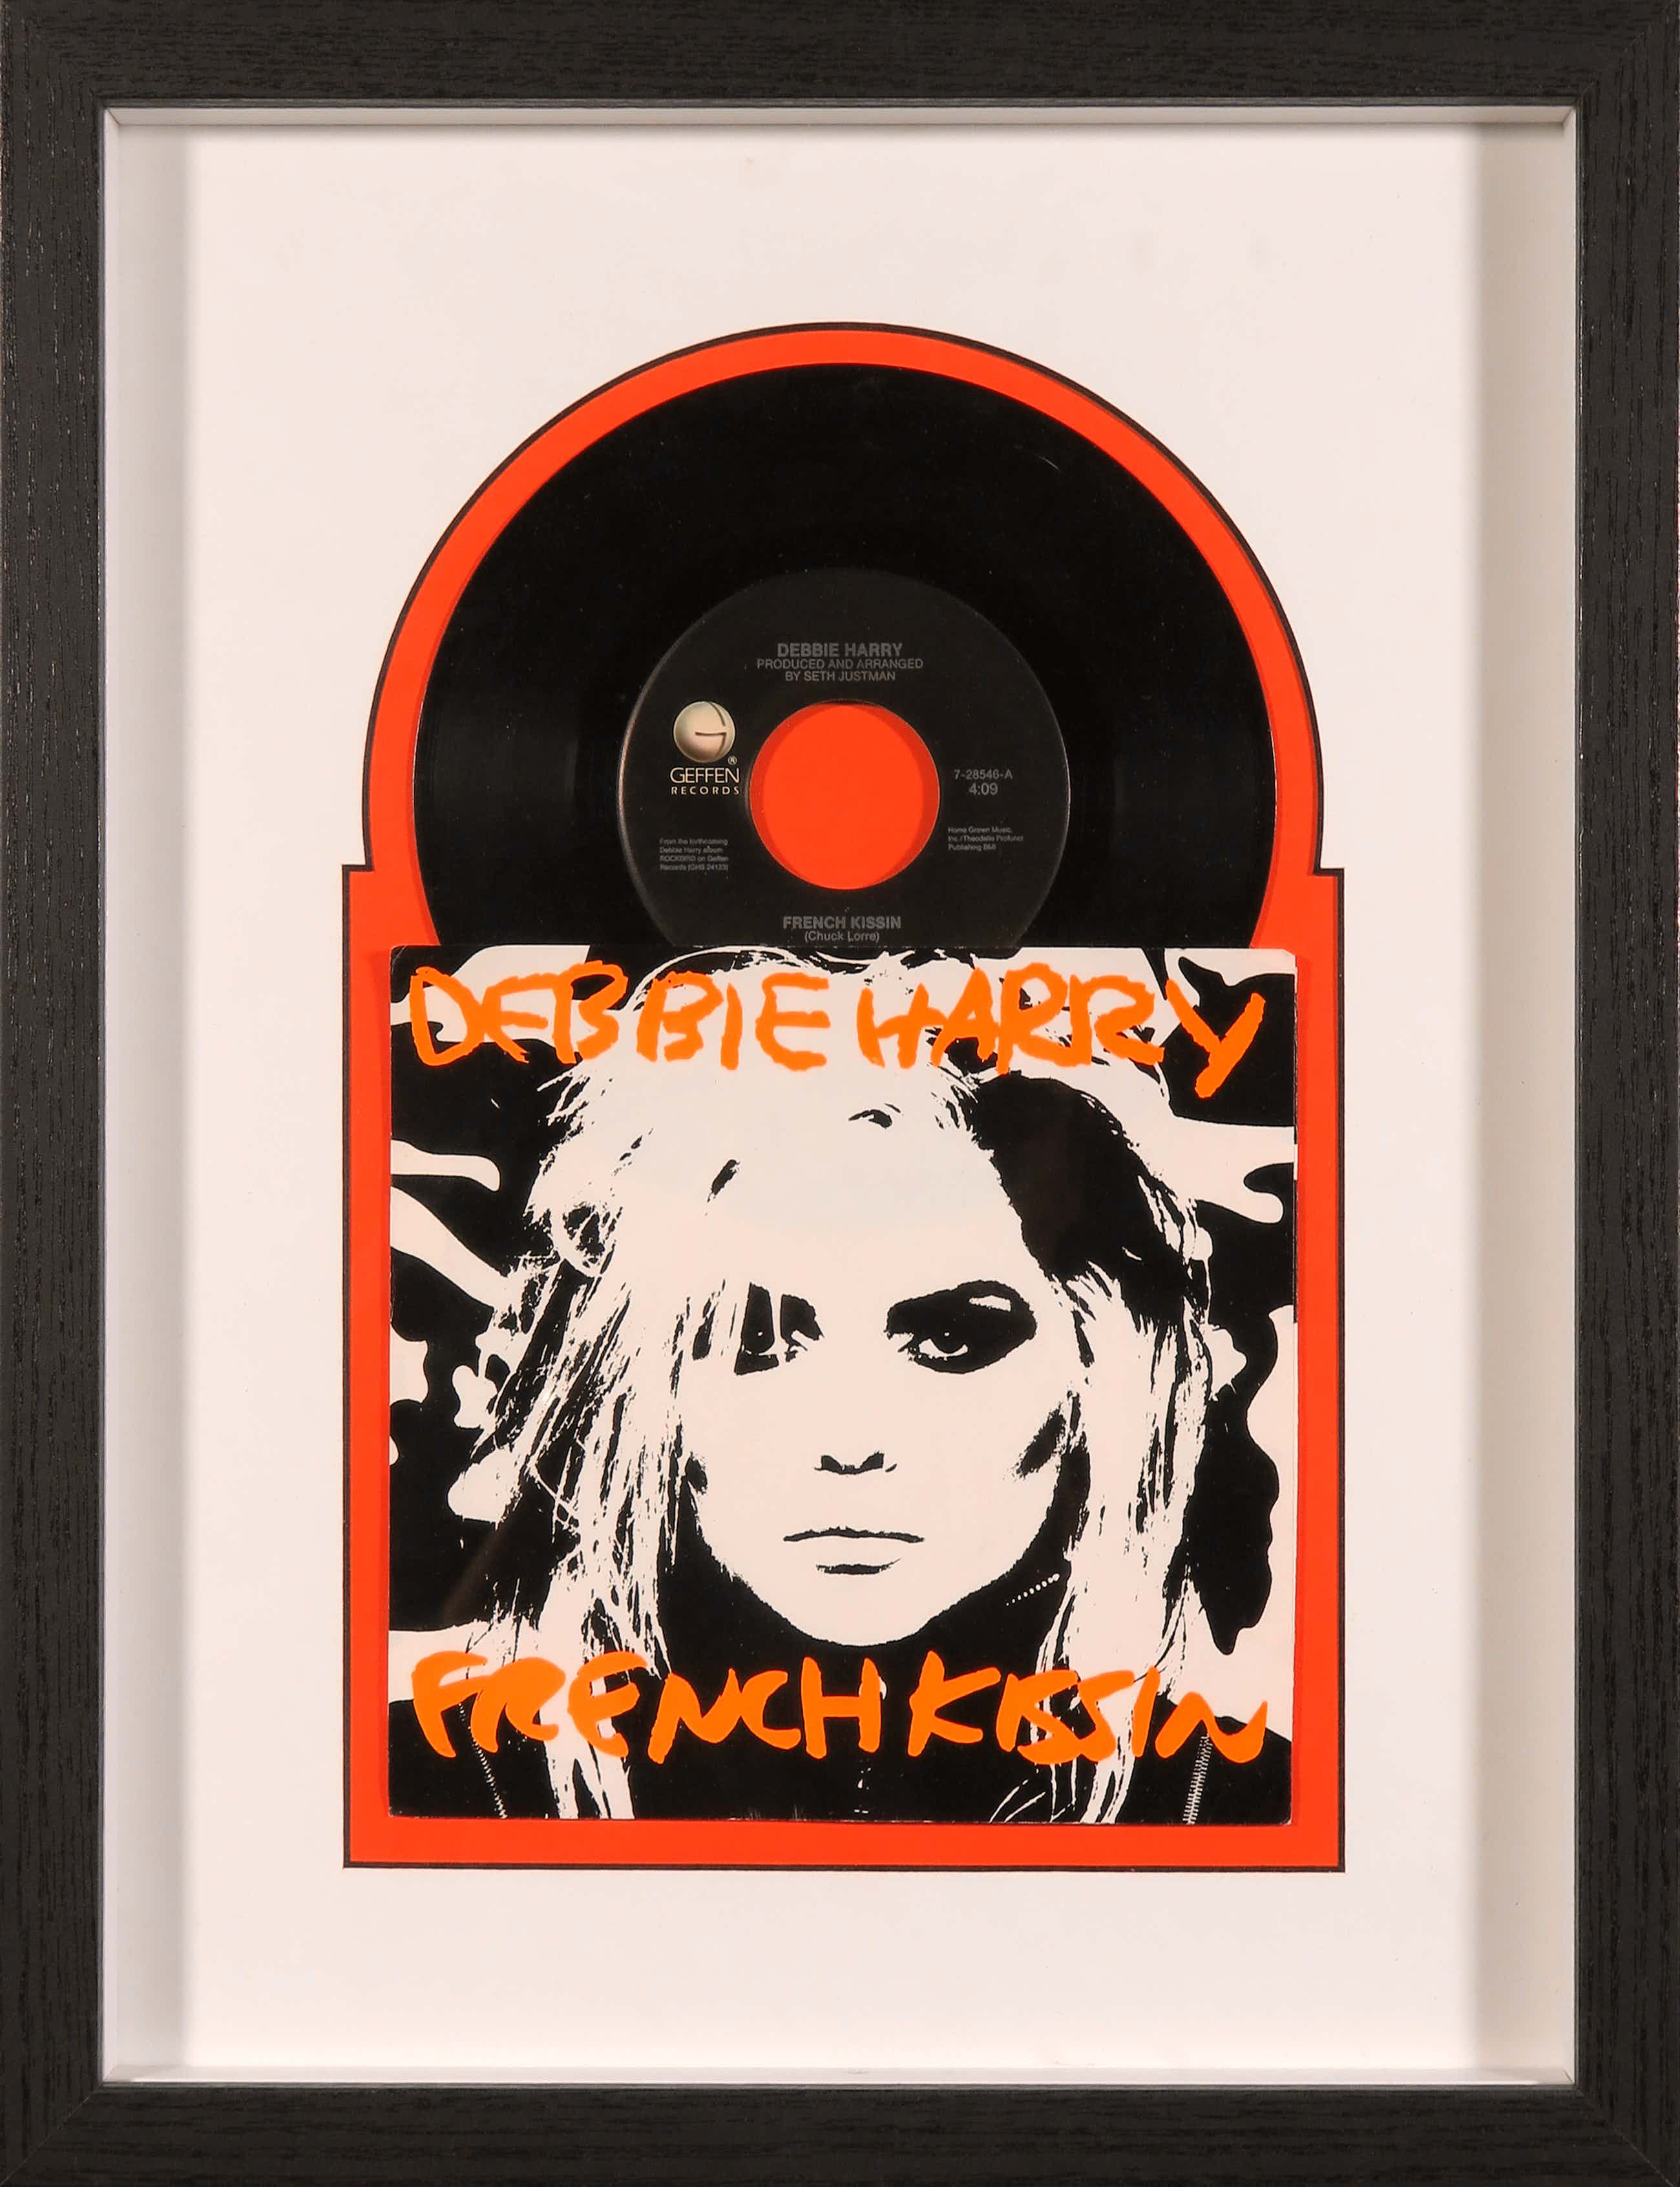 Andy Warhol - French Kissin - Debbie Harry kopen? Bied vanaf 50!